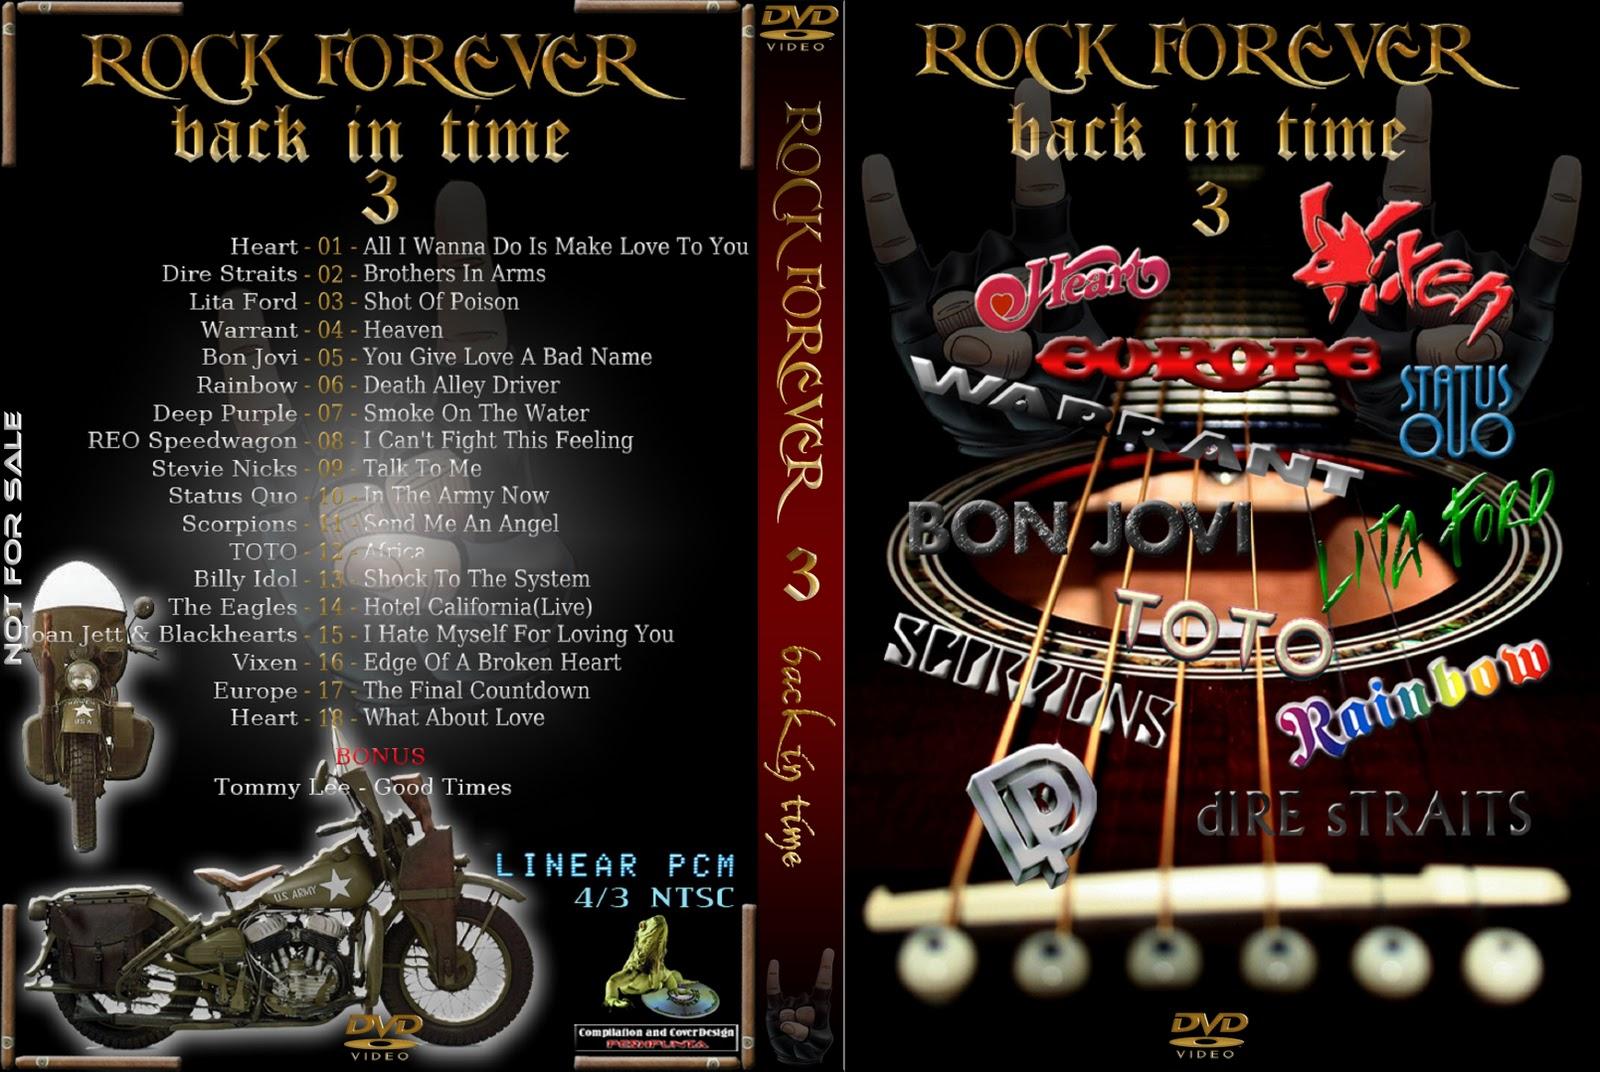 http://2.bp.blogspot.com/-BOG_1QUKULs/Tu5ypH7YVqI/AAAAAAAAAcg/hVkbkG_fKSA/s1600/rock+3.jpg